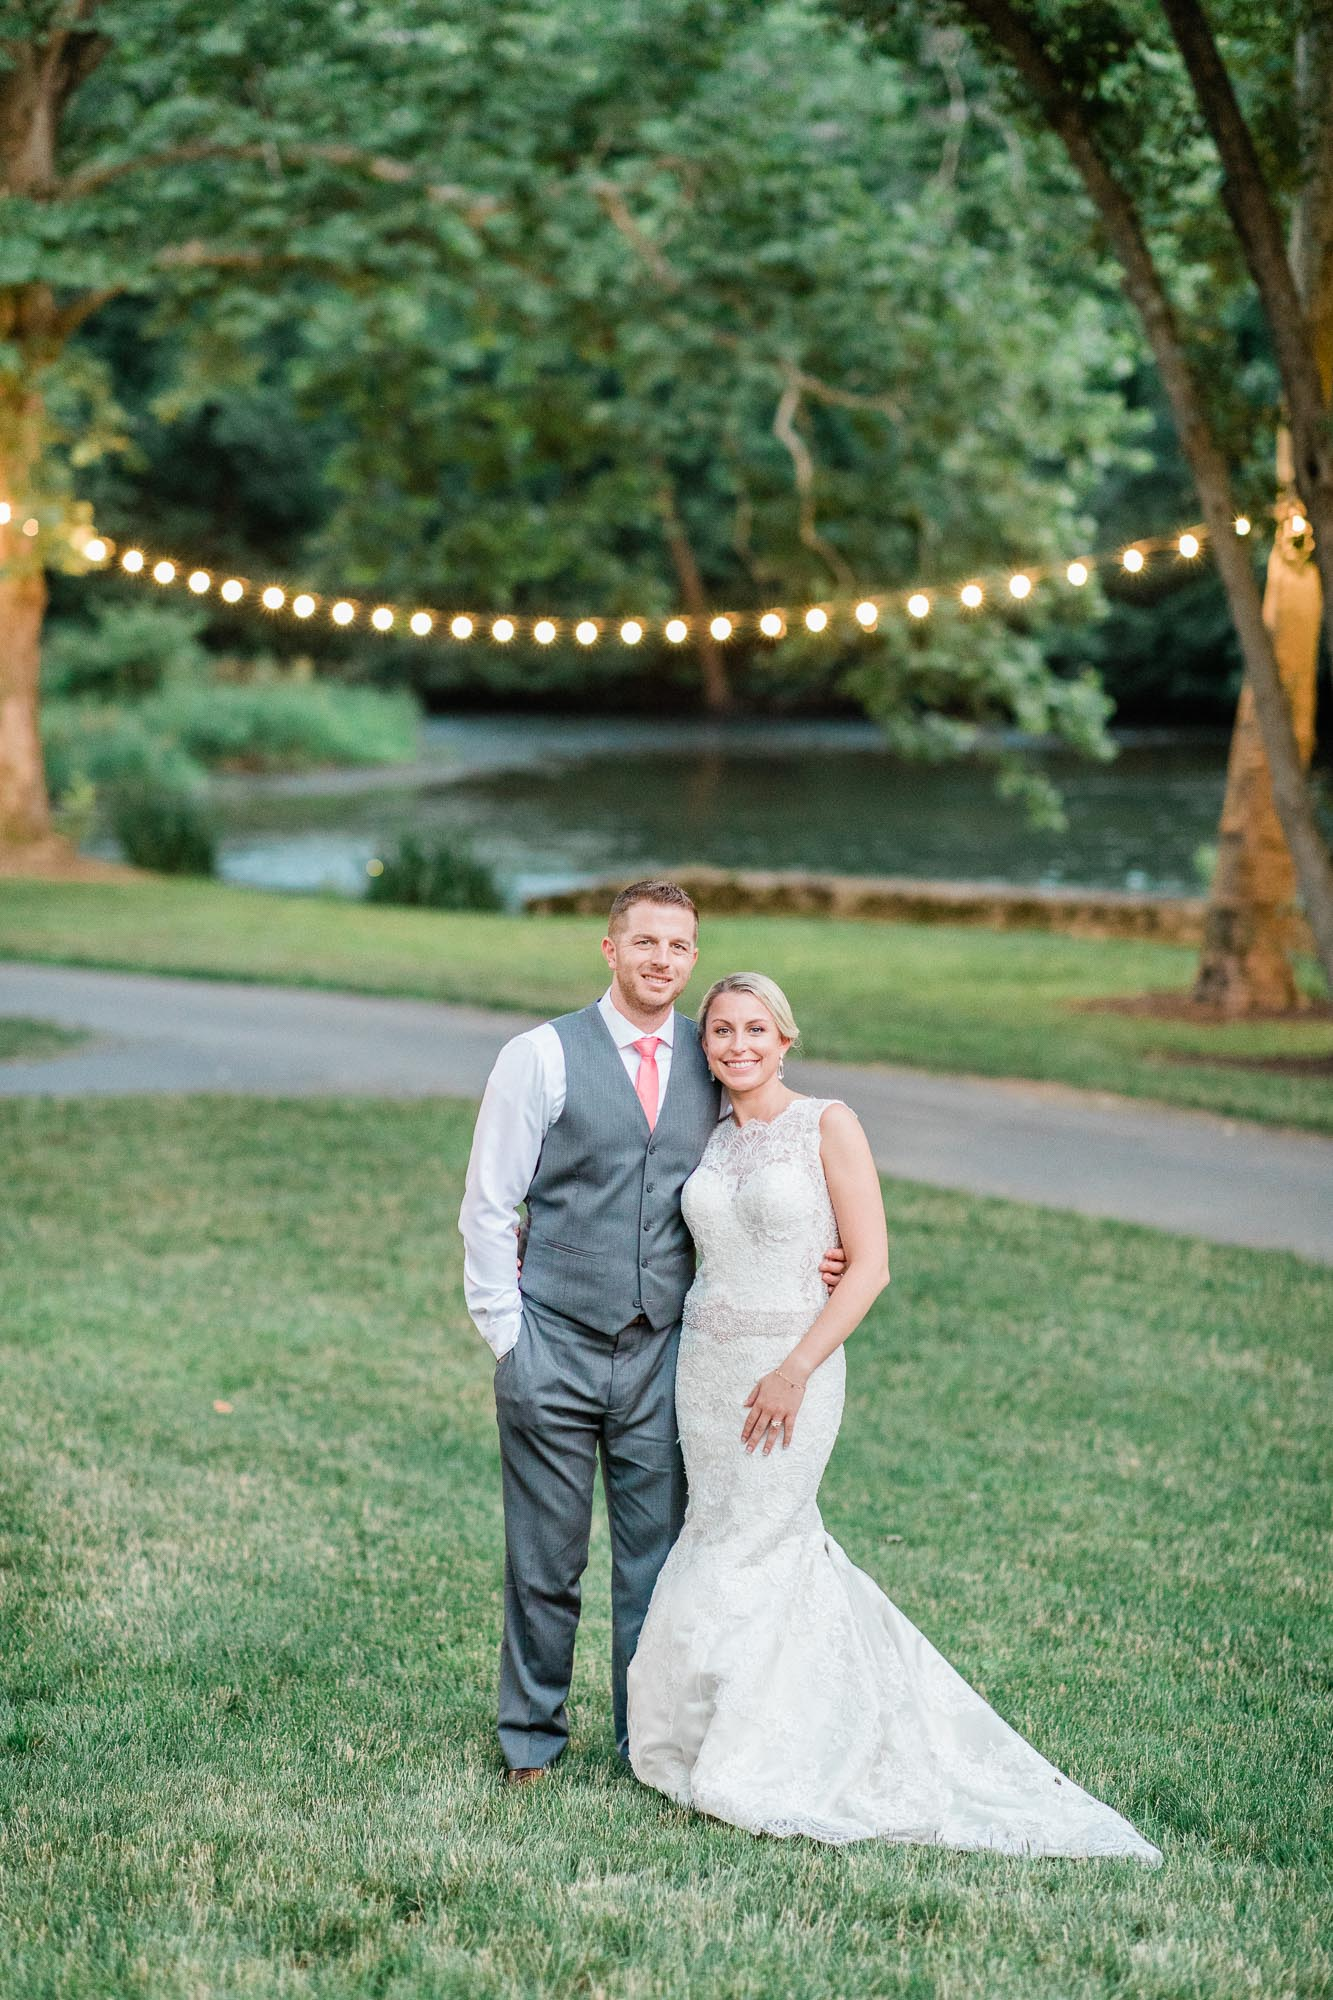 Allenberry-resort-historic-pennsylvania-wedding-22545.jpg